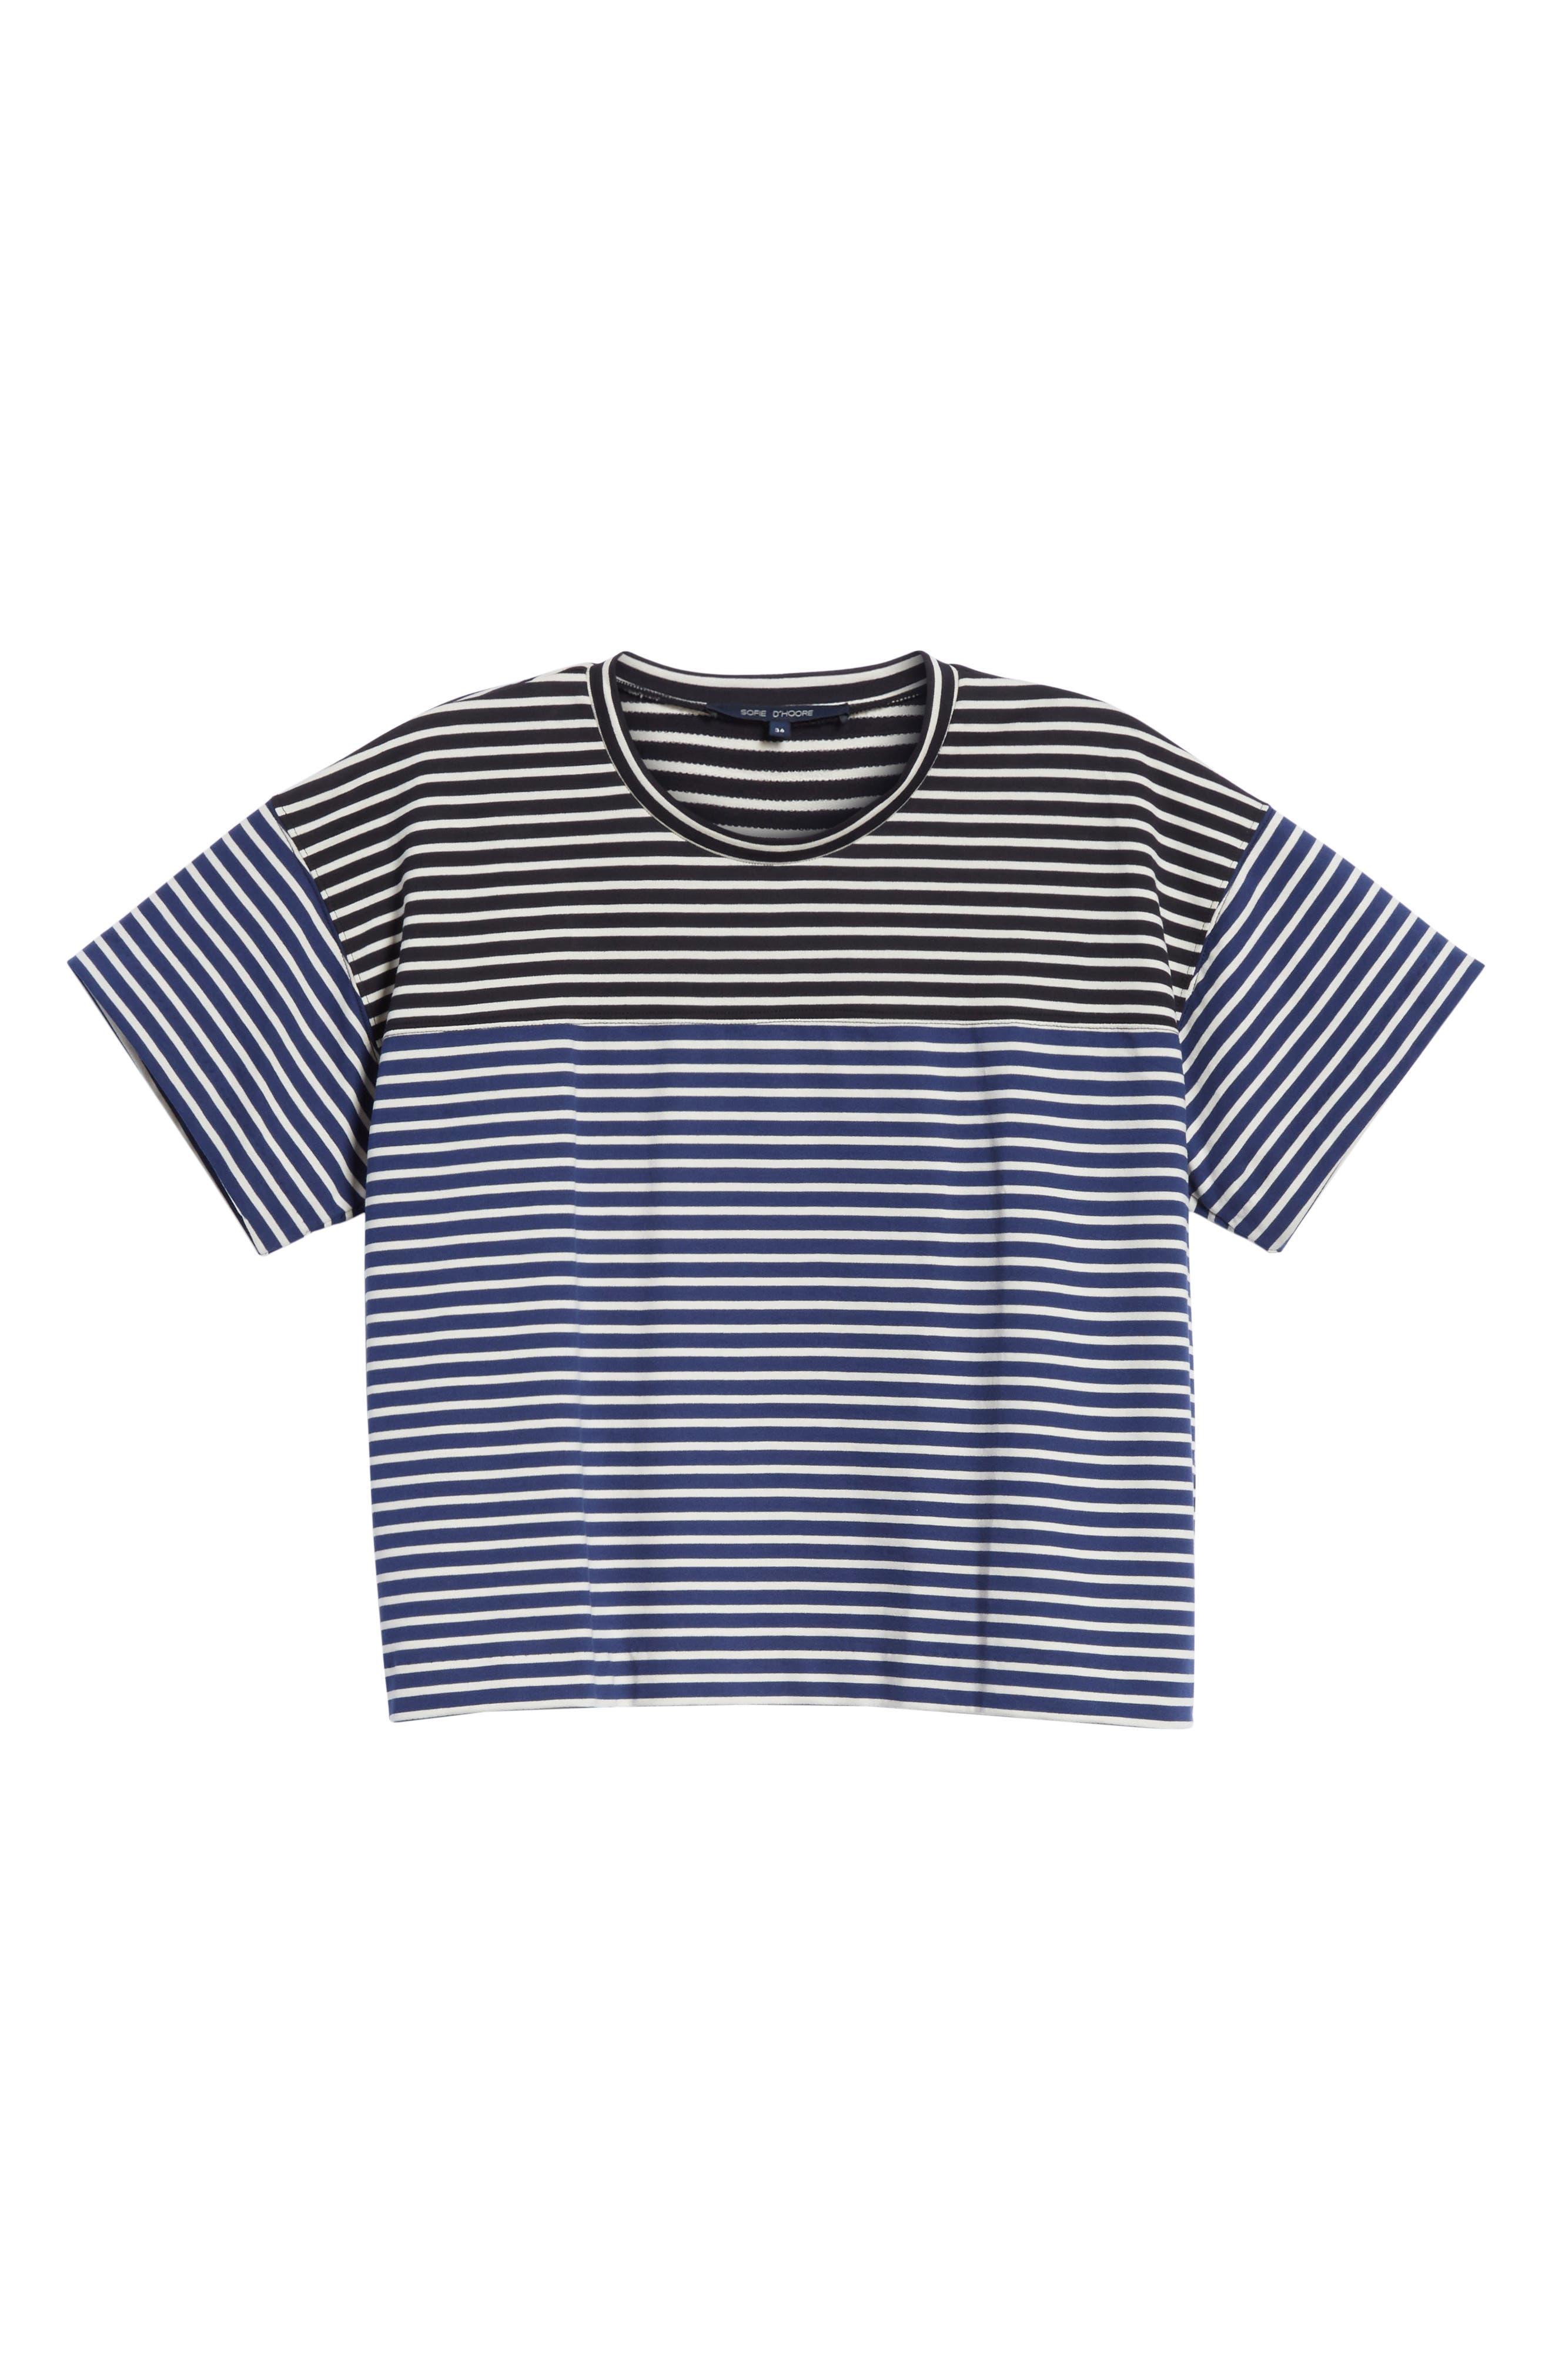 Nautical Stripe Tee,                             Alternate thumbnail 6, color,                             410